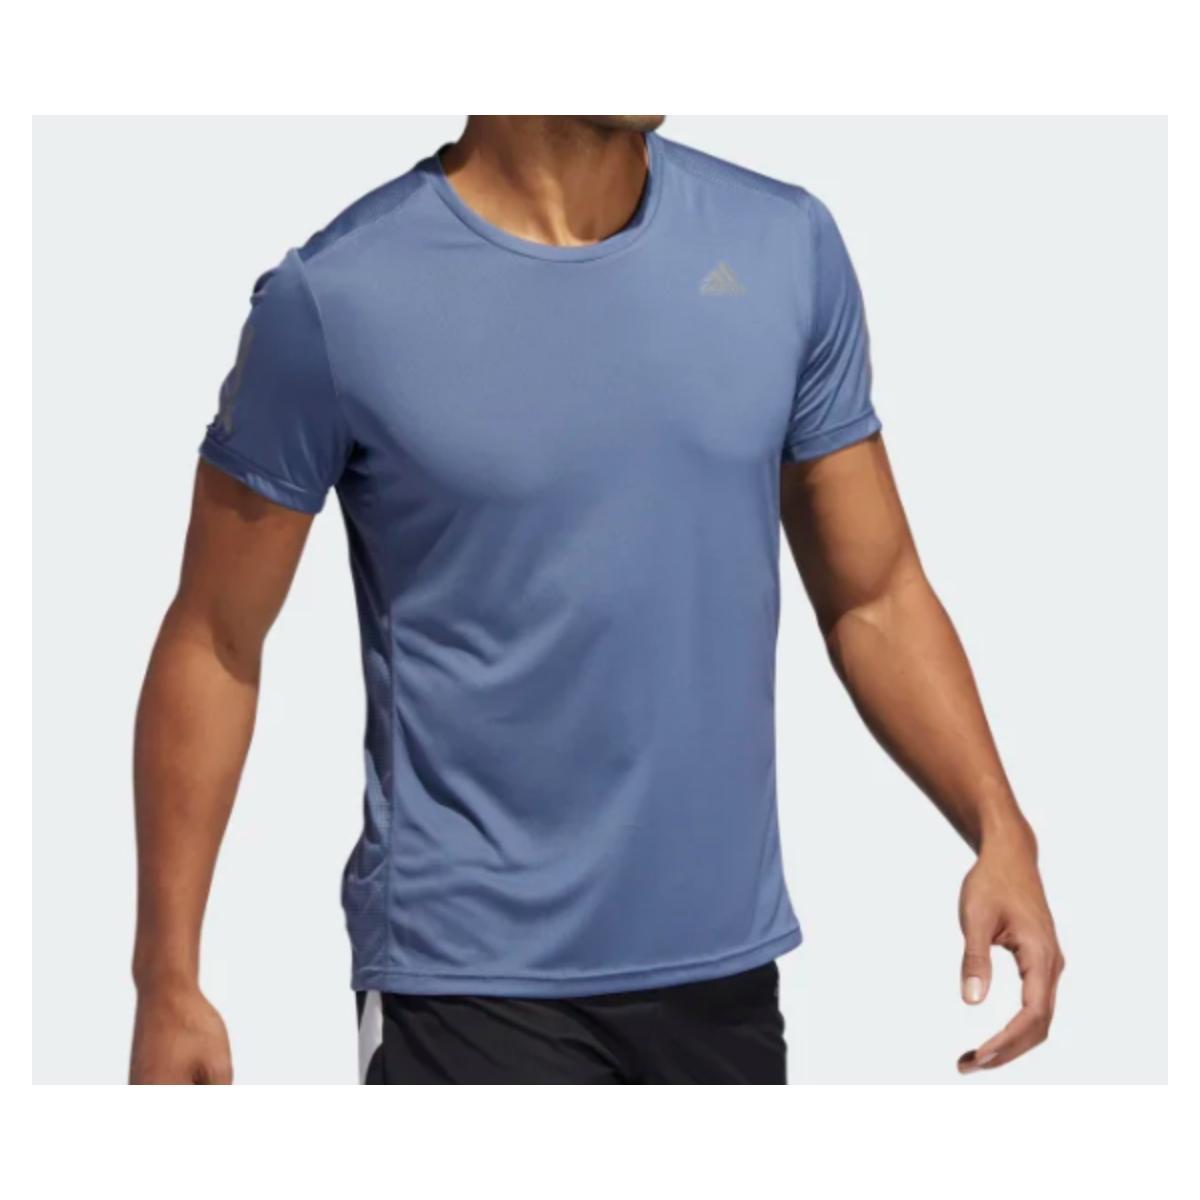 Camiseta Masculina Adidas Dz9005 Own The Run m Azul